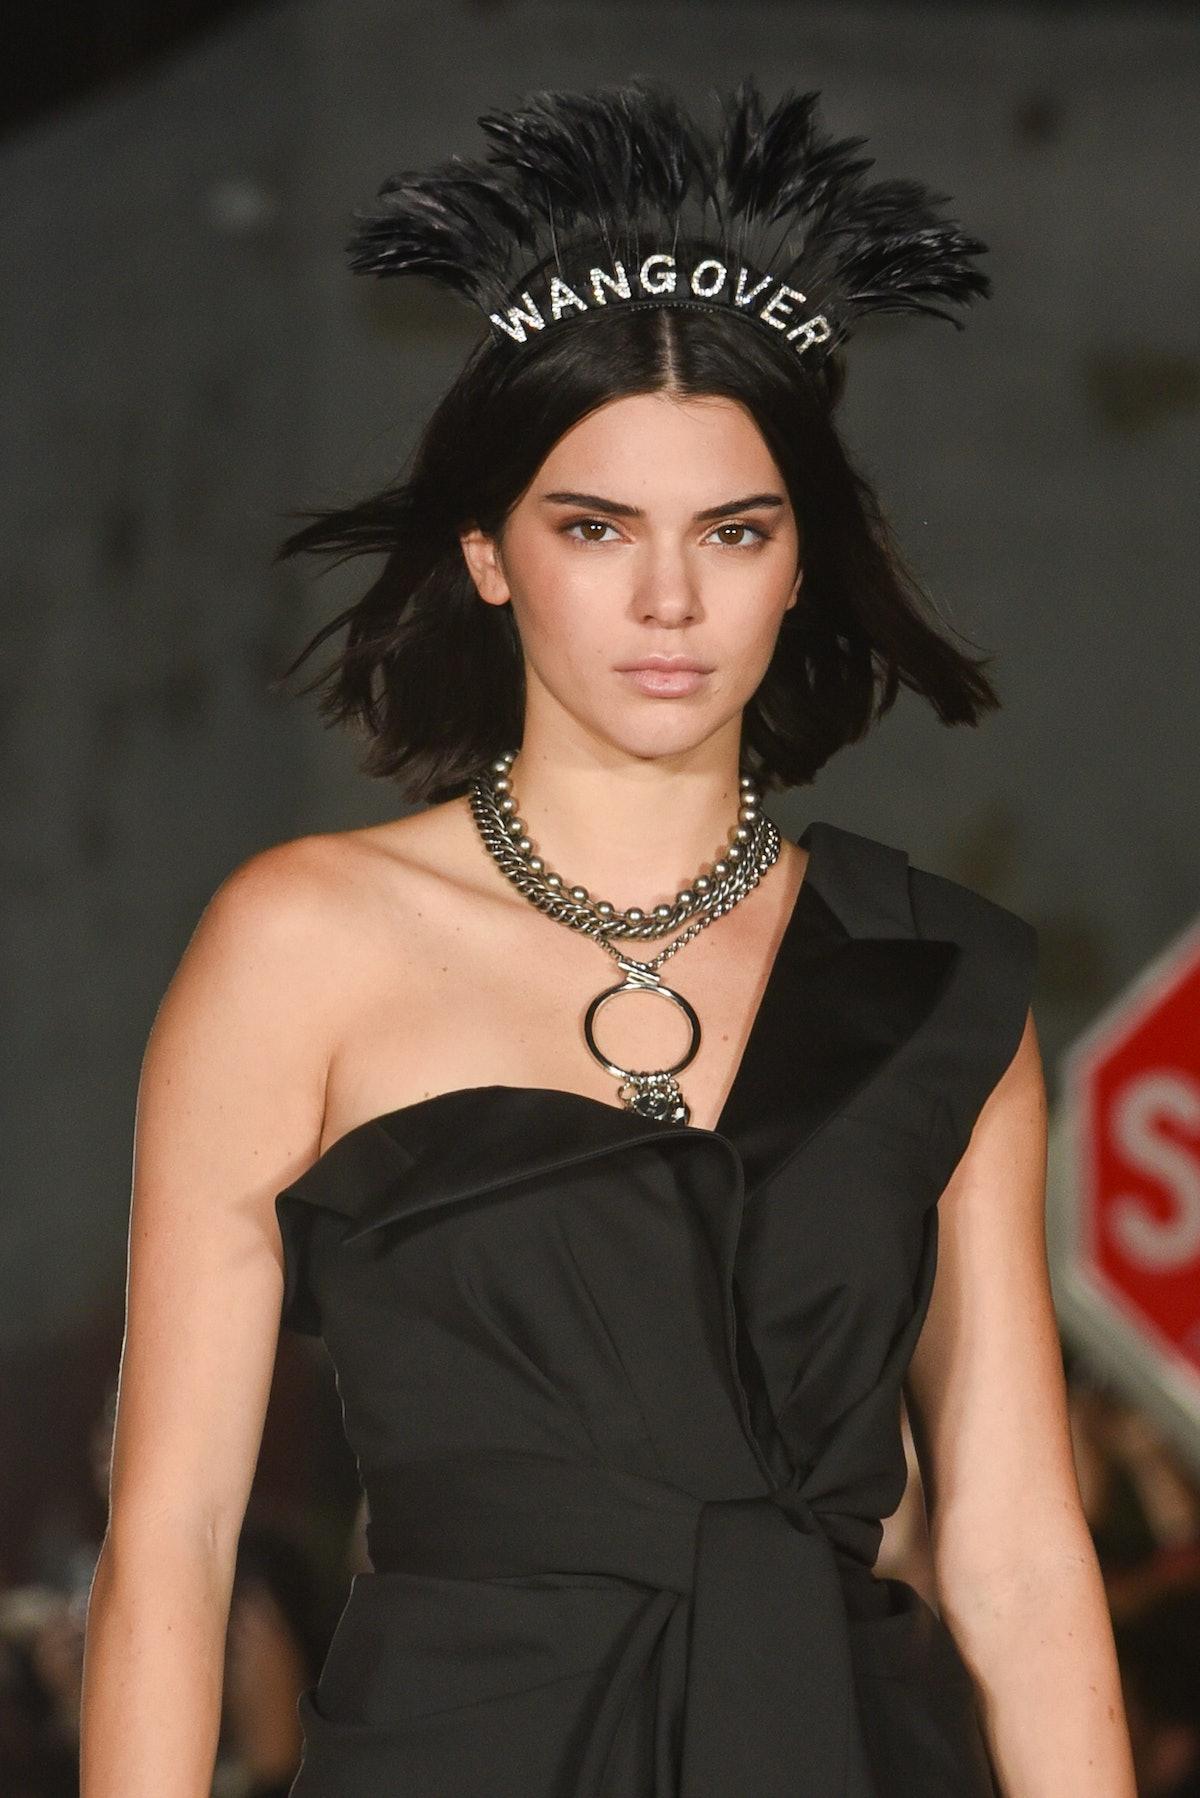 Alexander Wang fashion show during New York Fashion Week